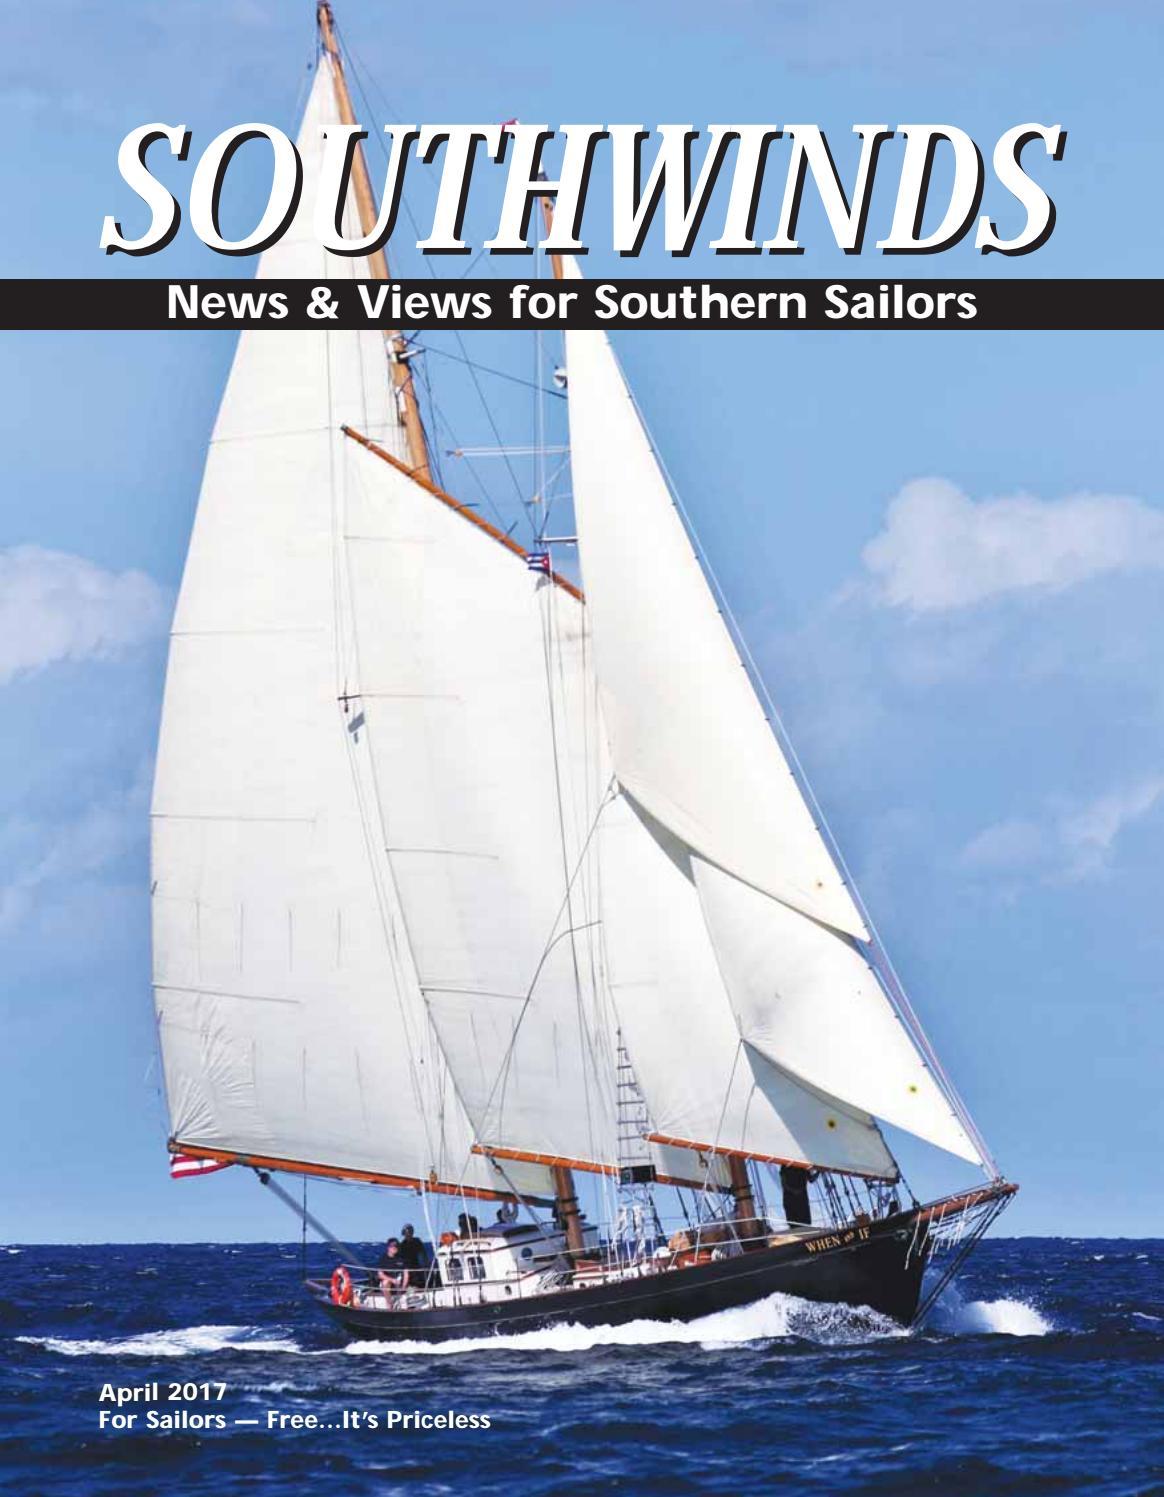 Southwinds April 2017 by SOUTHWINDS Magazine - issuu